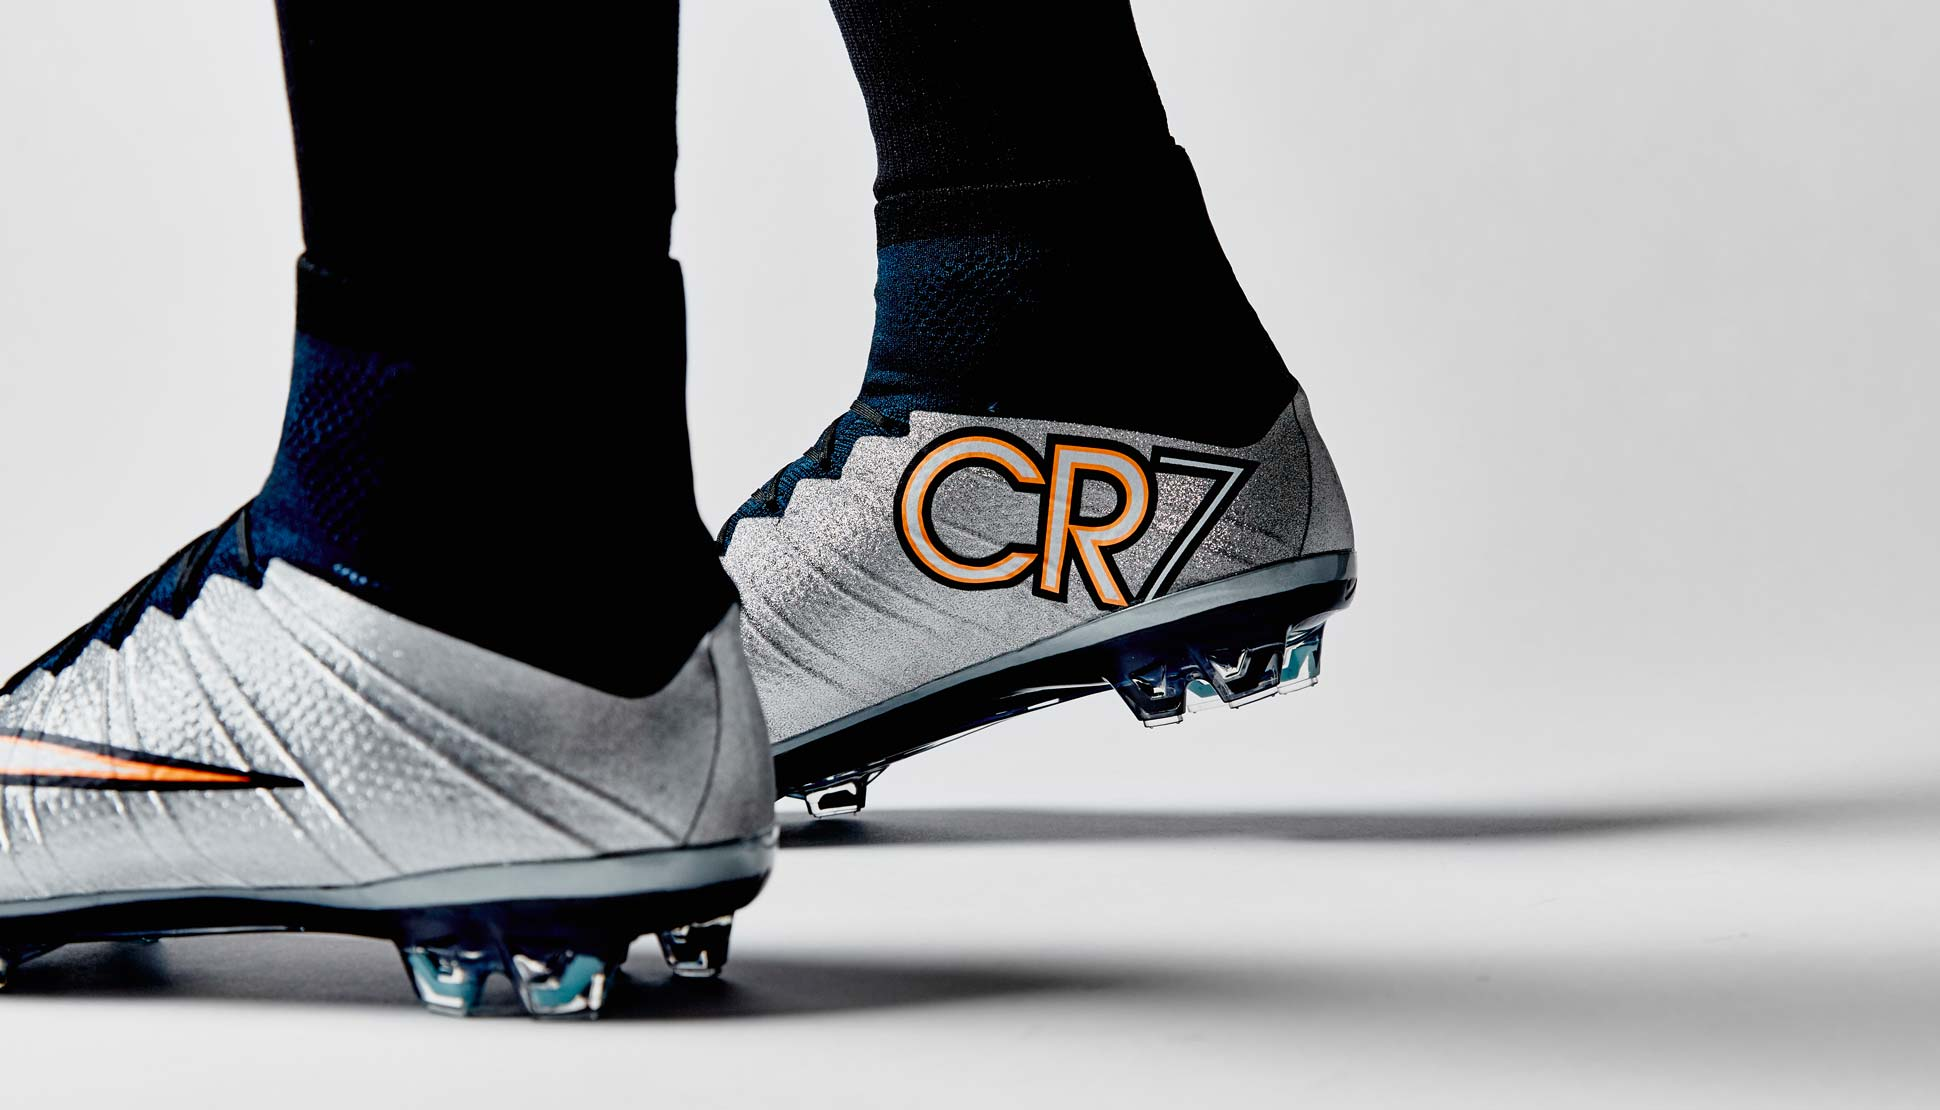 Nike Mercurial Superfly CR7 \